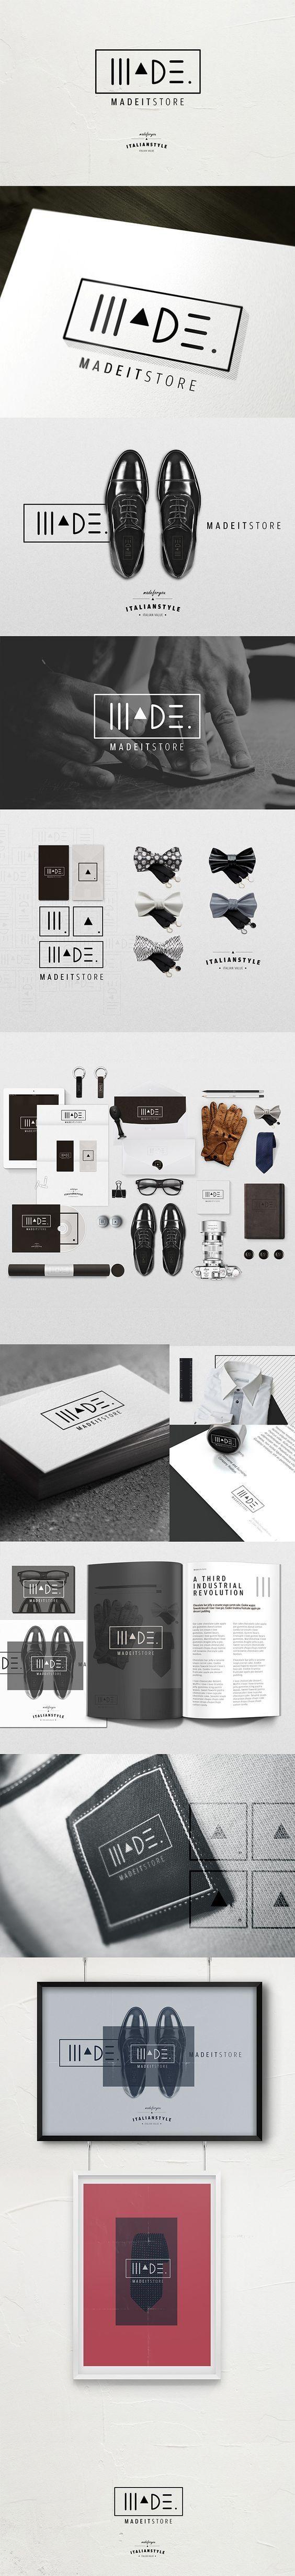 Madeit Store Branding | Fivestar Branding – Design and Branding Agency & Inspiration Gallery